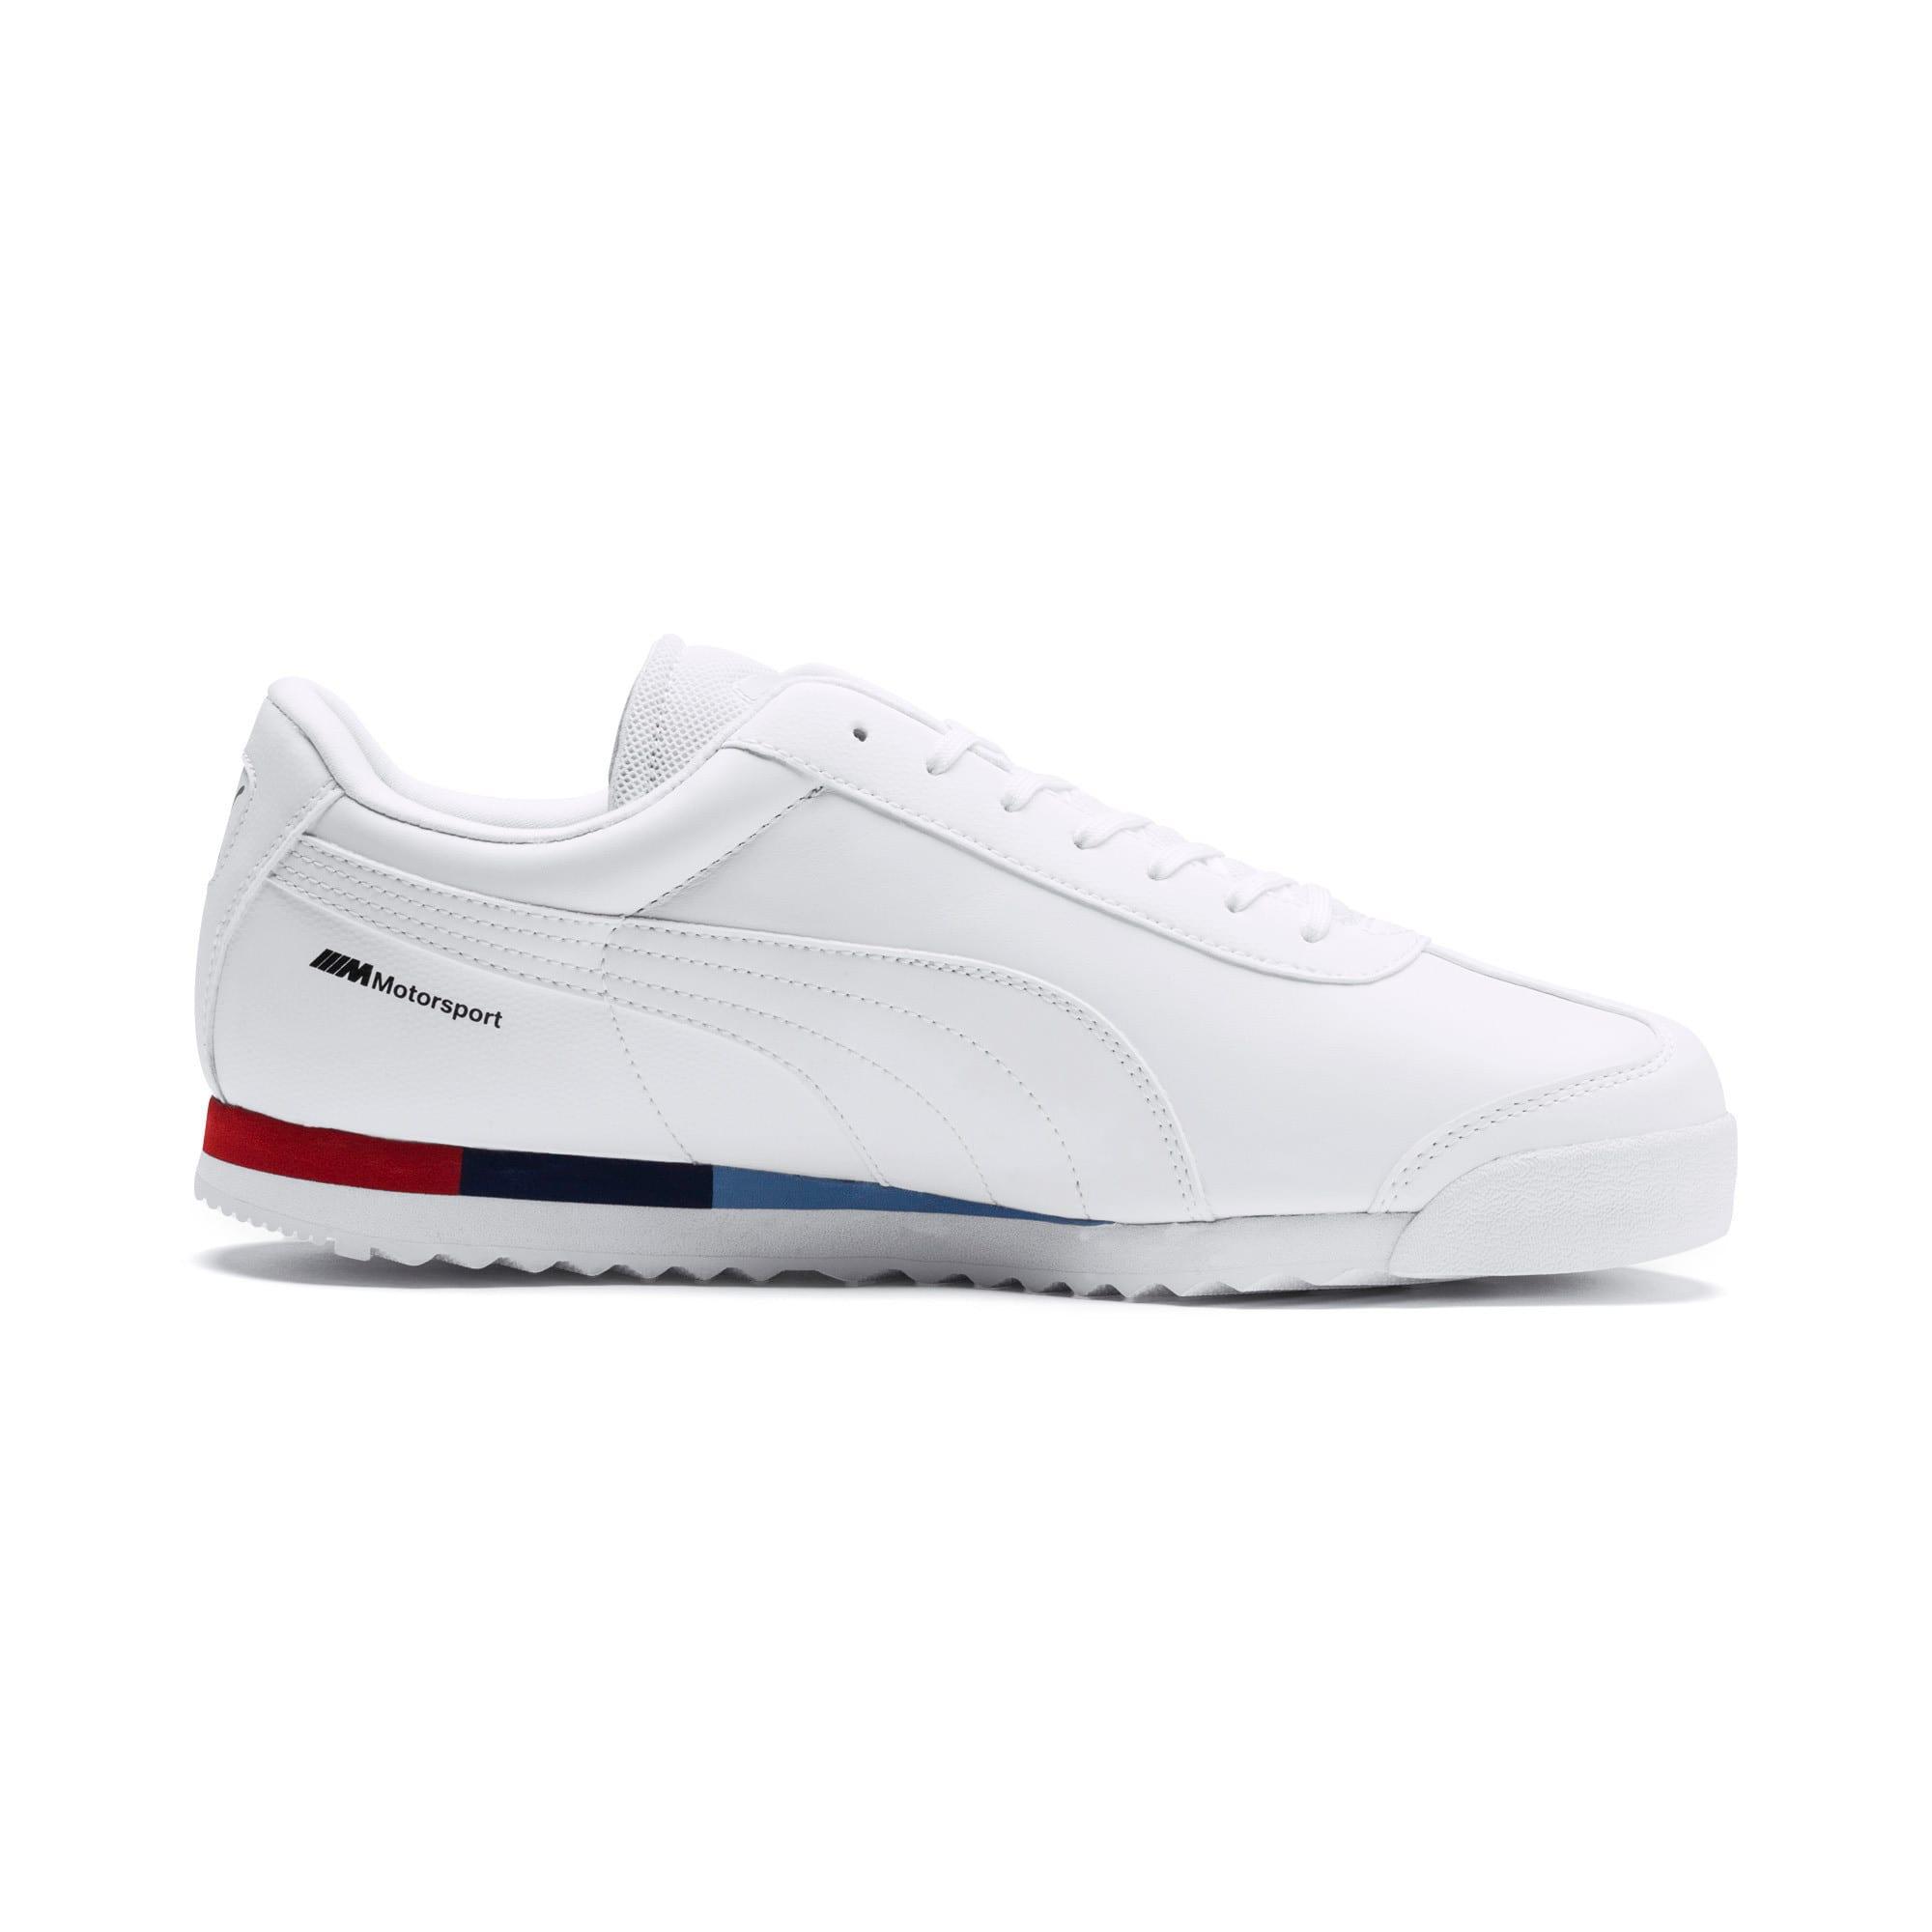 Thumbnail 5 of BMW M Motorsport Roma Men's Sneakers, Puma White-Puma White, medium